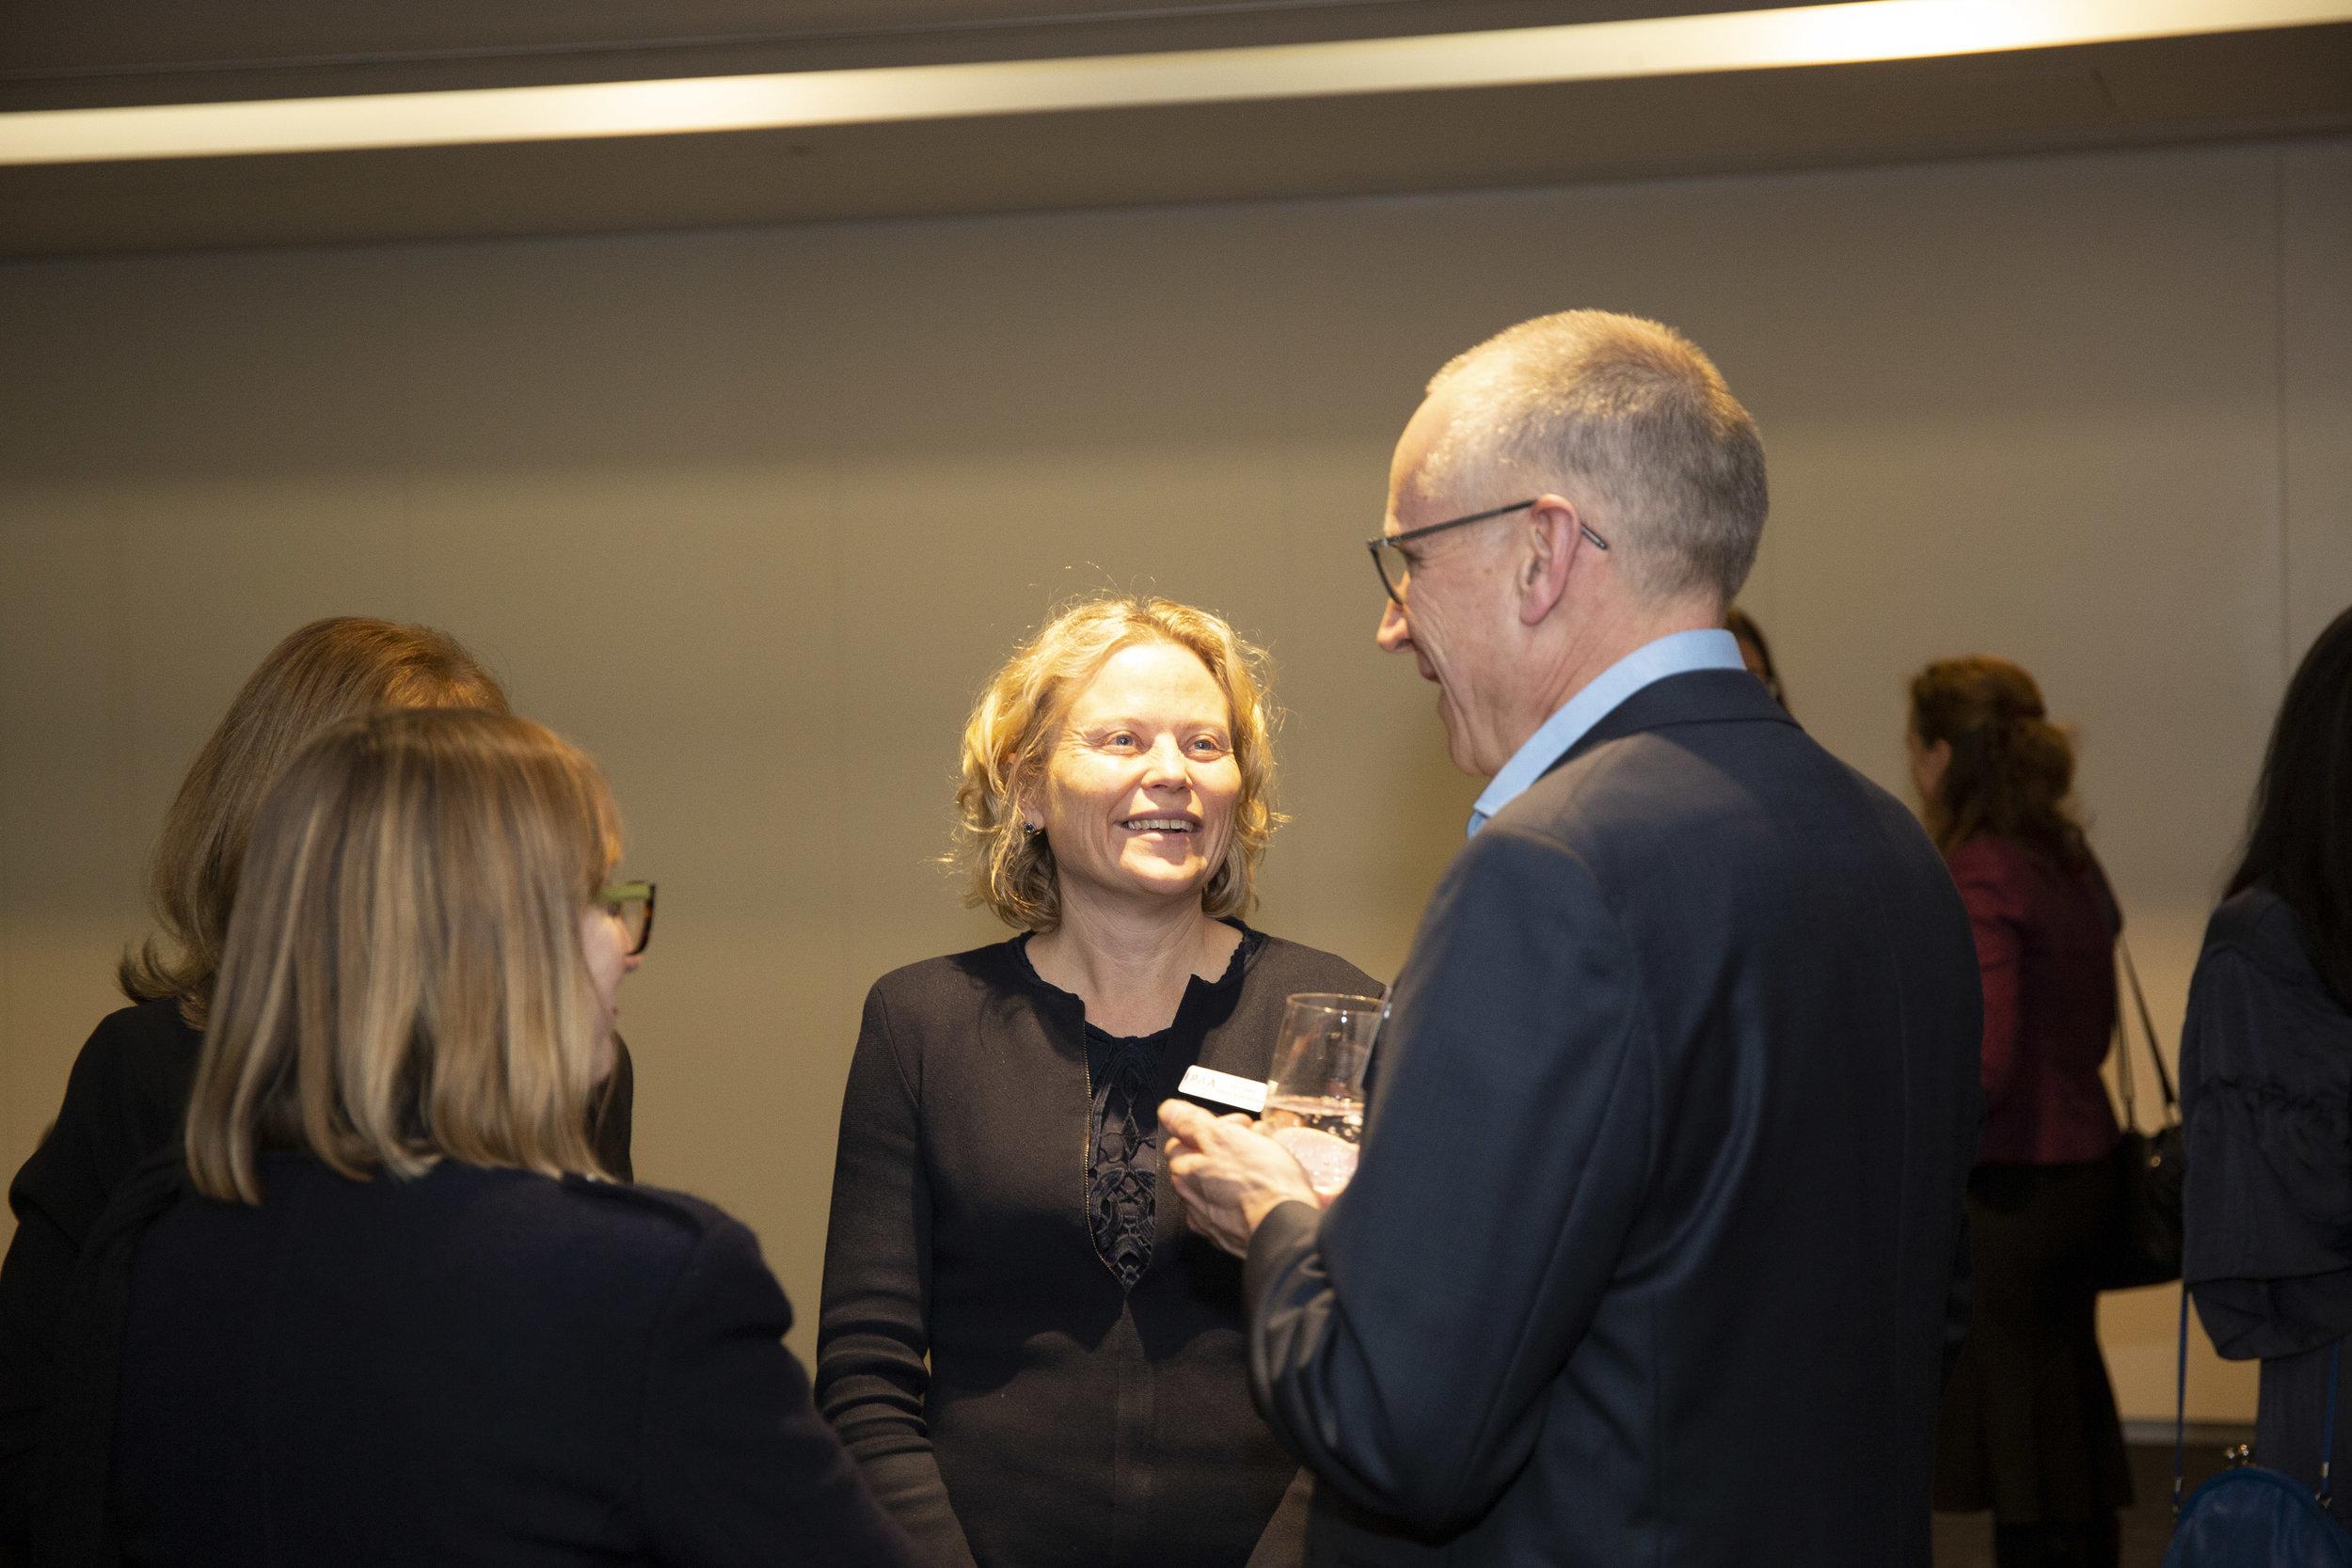 IPAA Victoria's president, Kym Peake, interacts with alumni